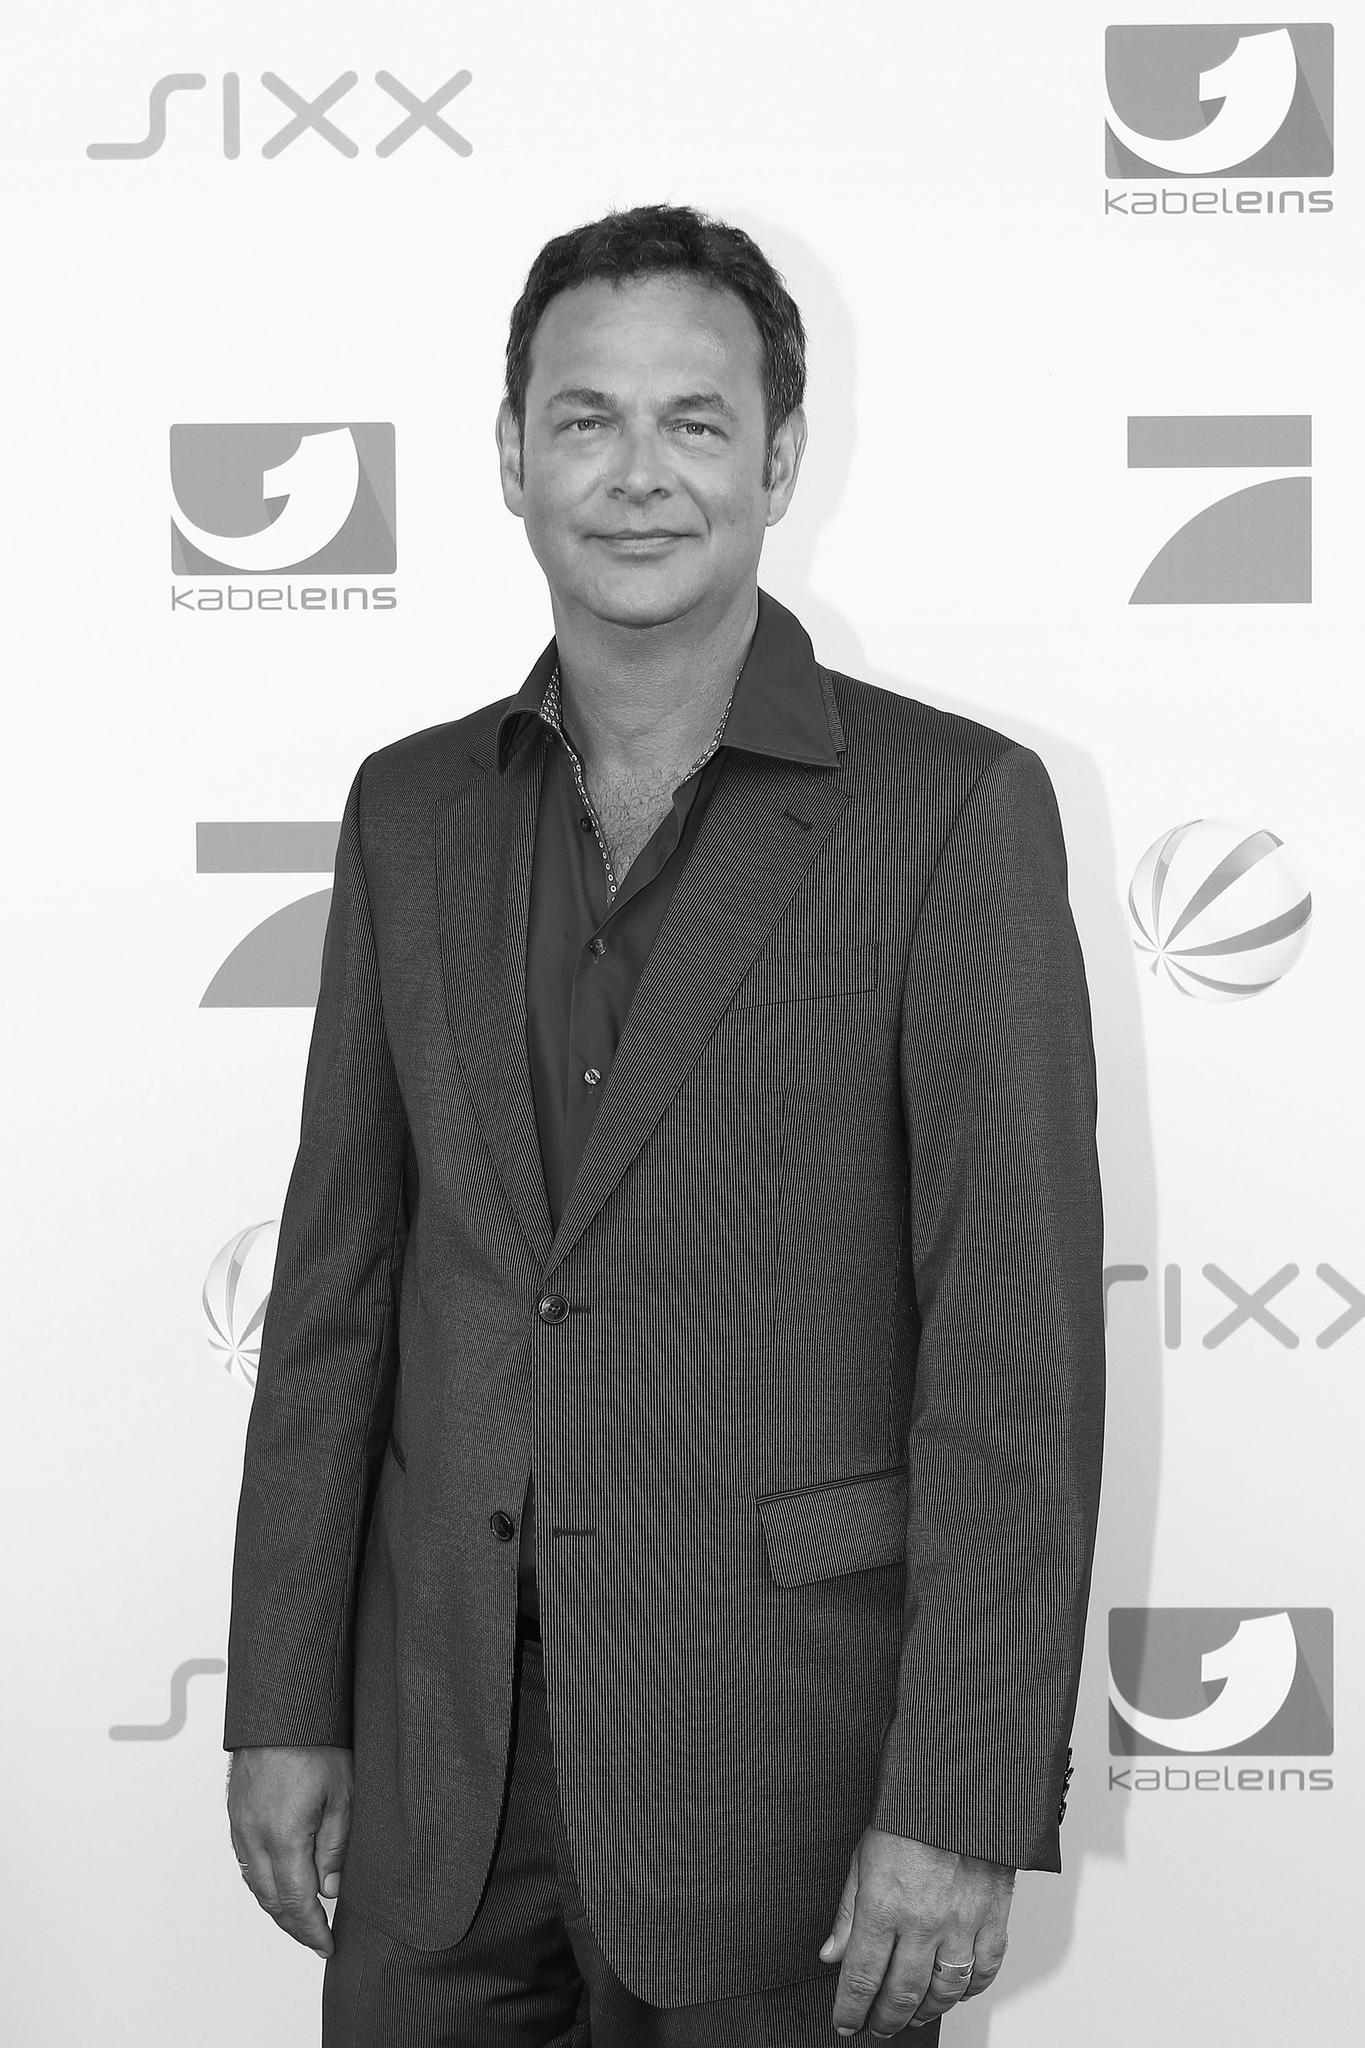 Martin Haas